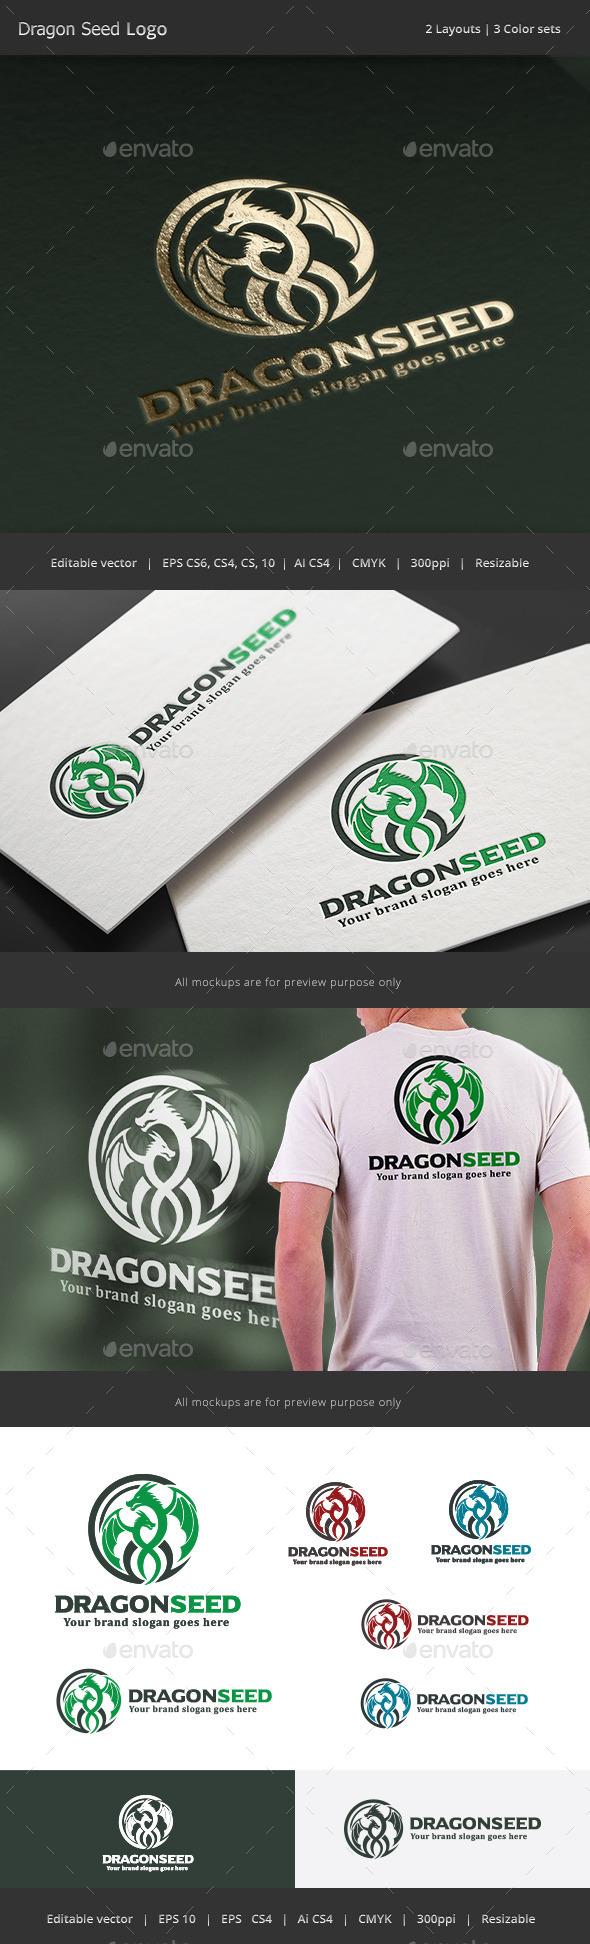 Dragon Seed Logo